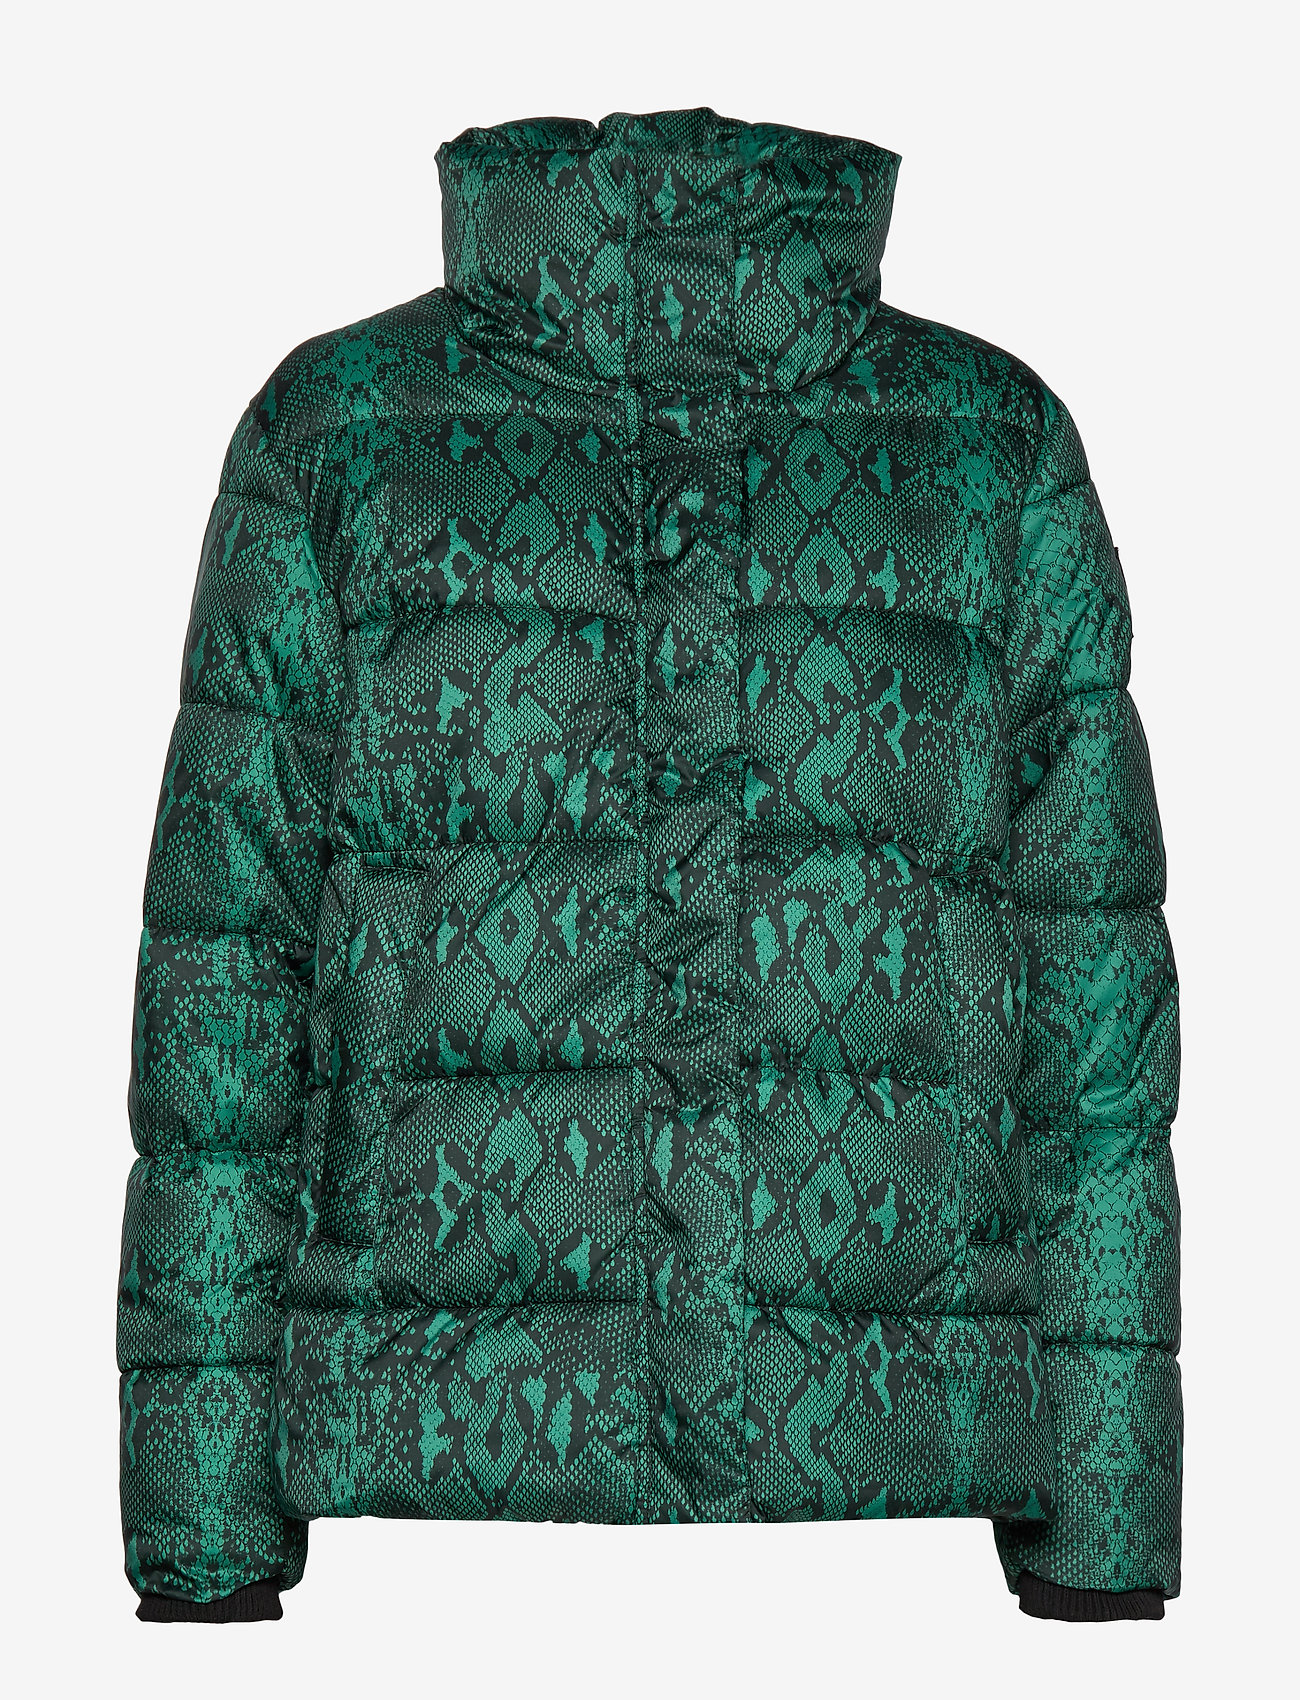 Replay Jacket - Jakker og frakker BLACK/GREEN SNAKE - Dametøj Særtilbud